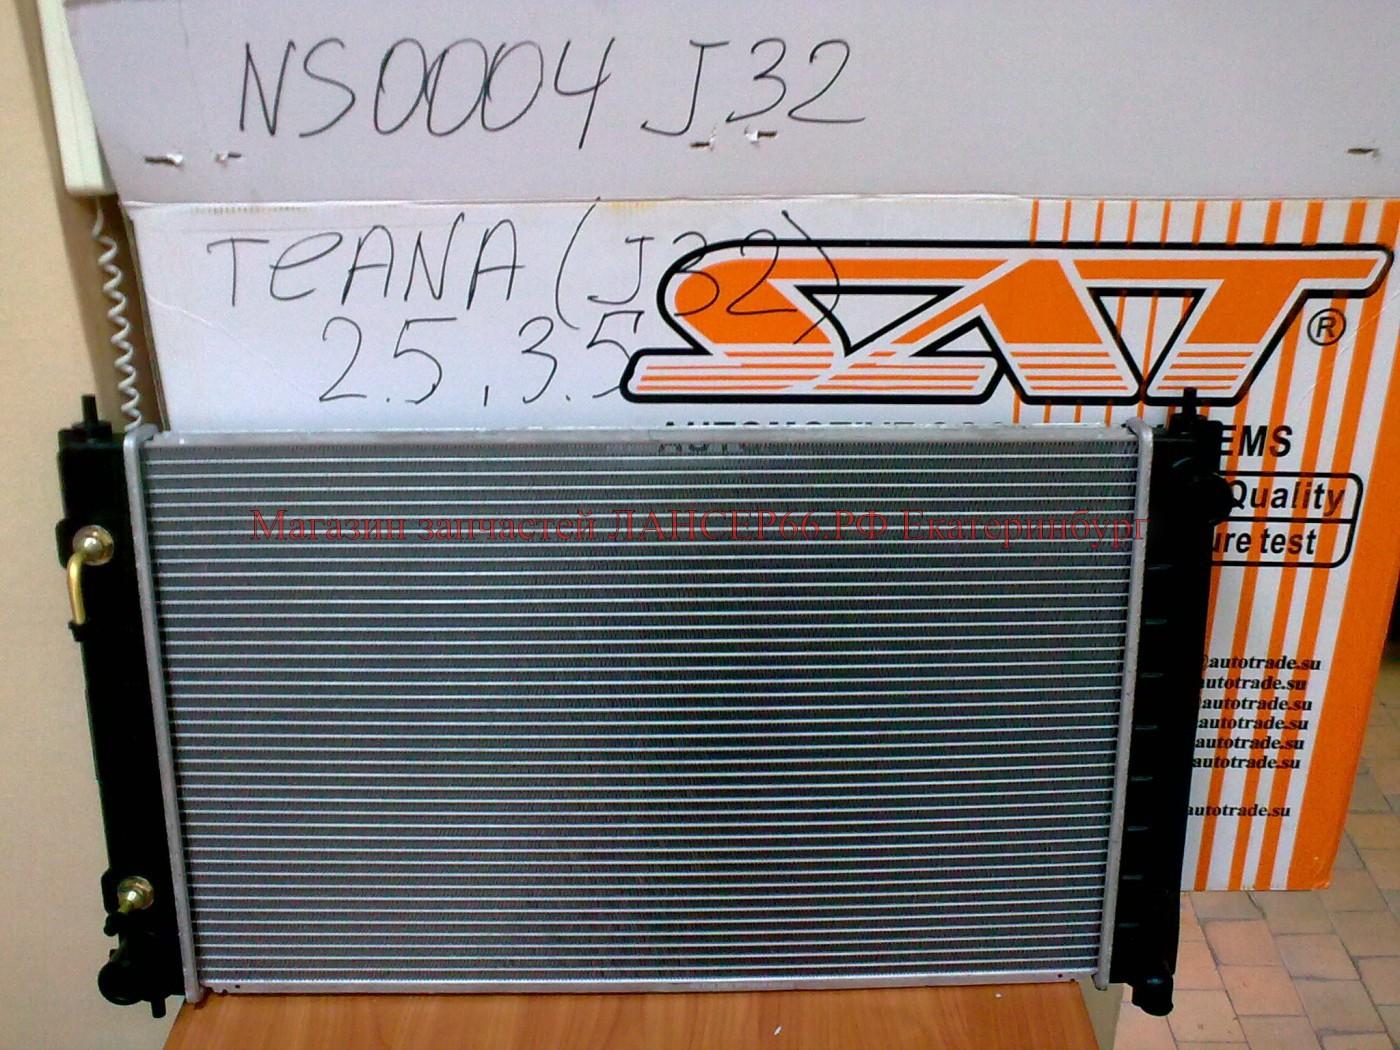 Замена радиатора ниссан теана j32